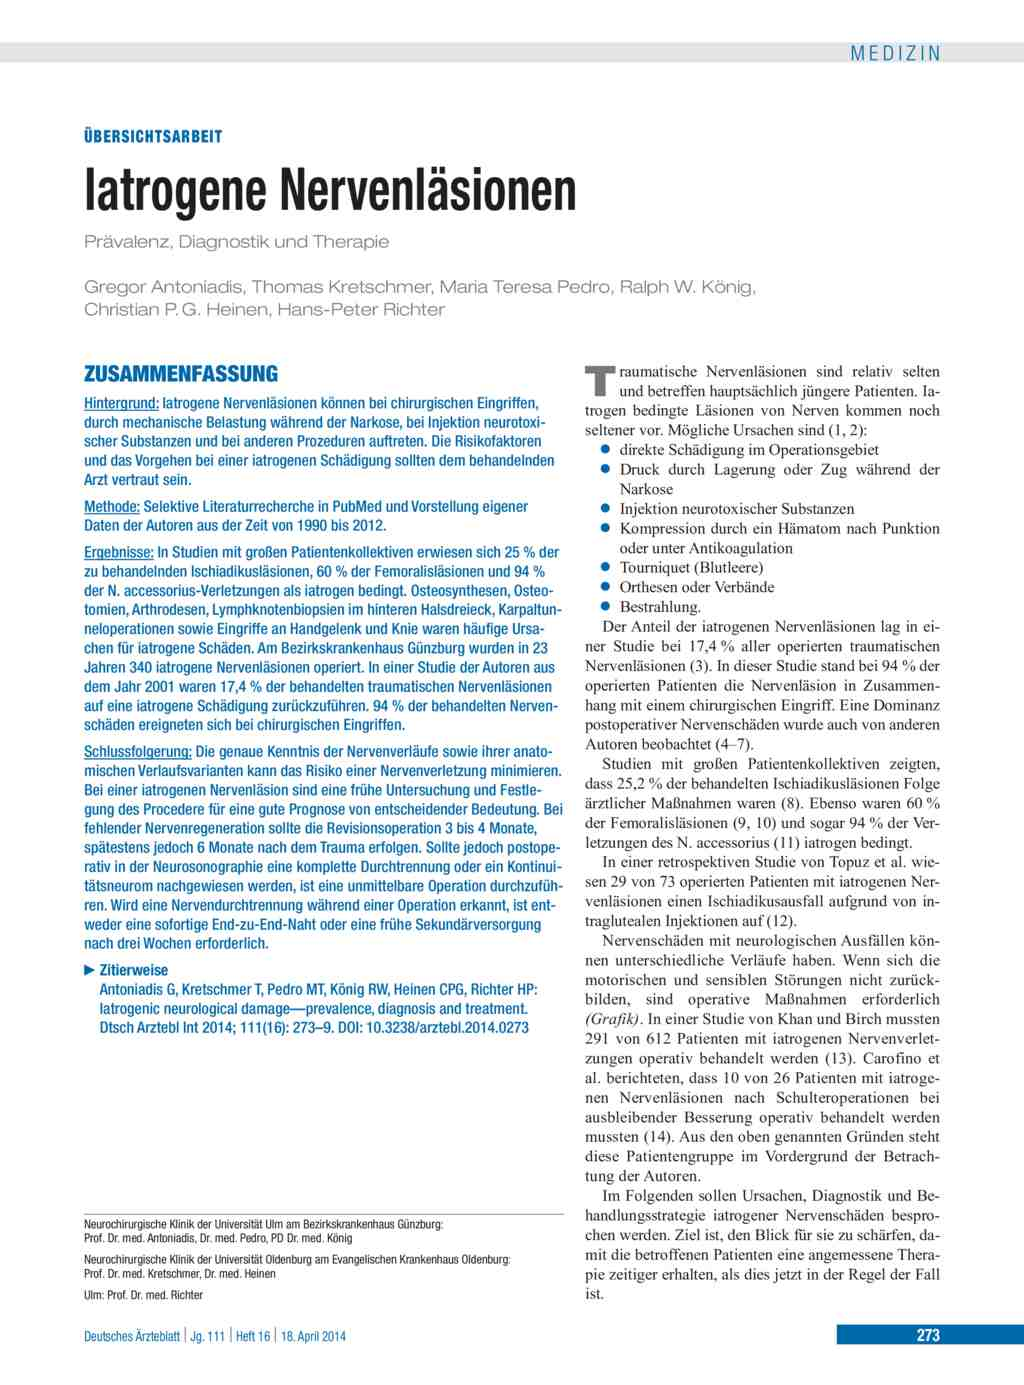 Iatrogene Nervenläsionen